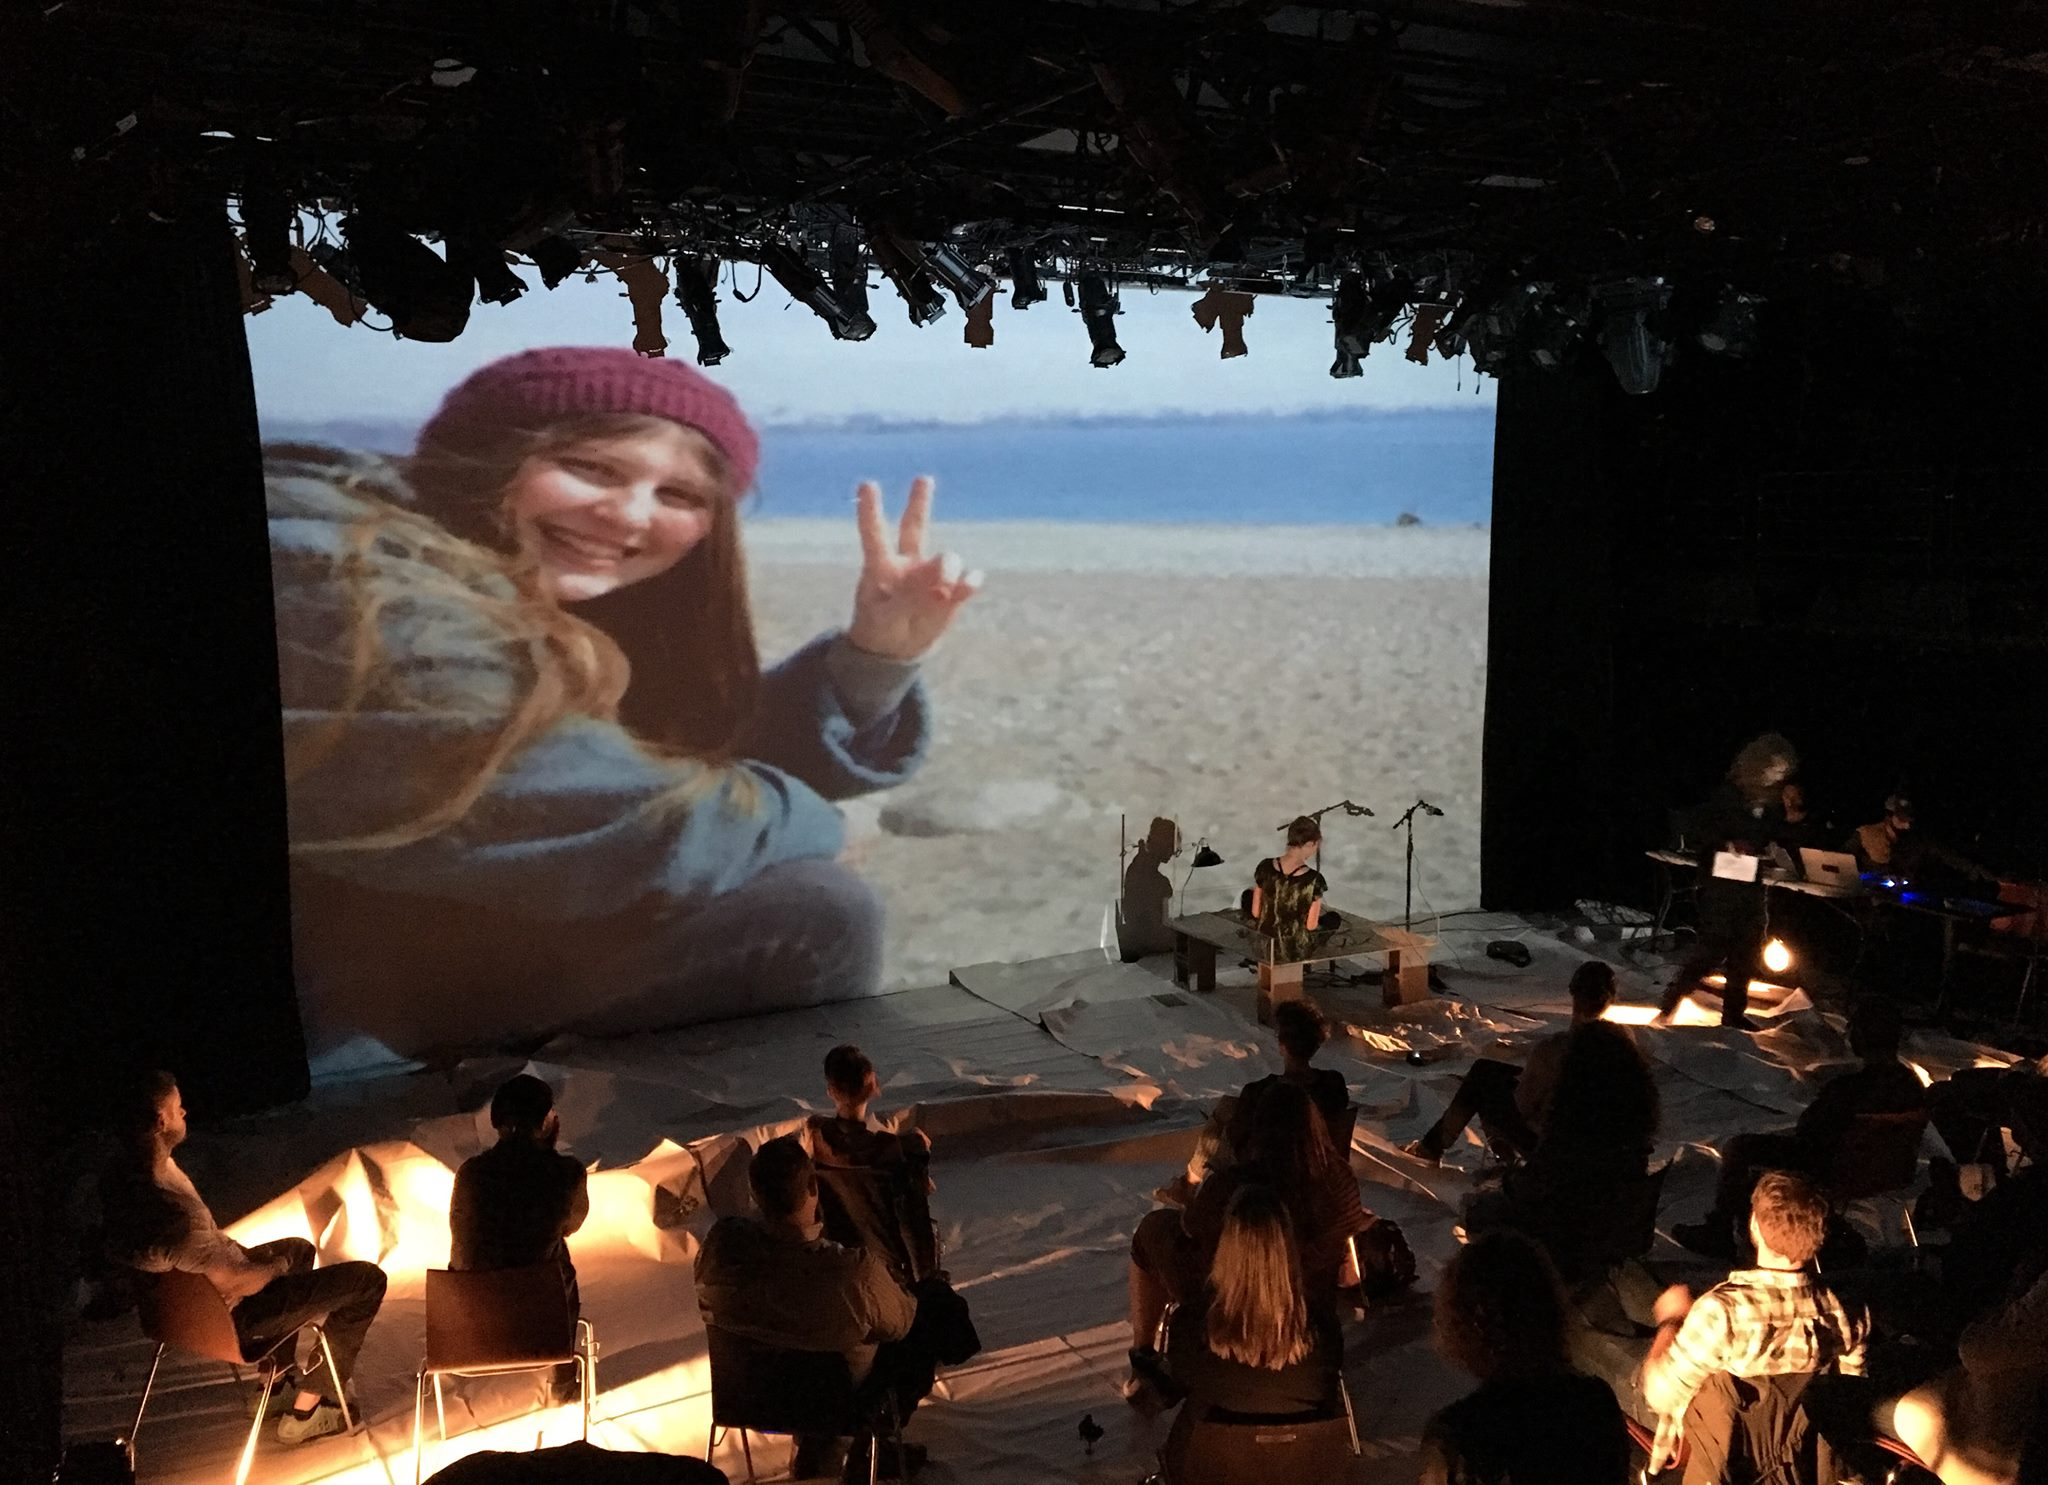 Photographs from June 2017 performance: projected image of Ayse Deniz Karacagil, tortoise stage, paper floor, audience.